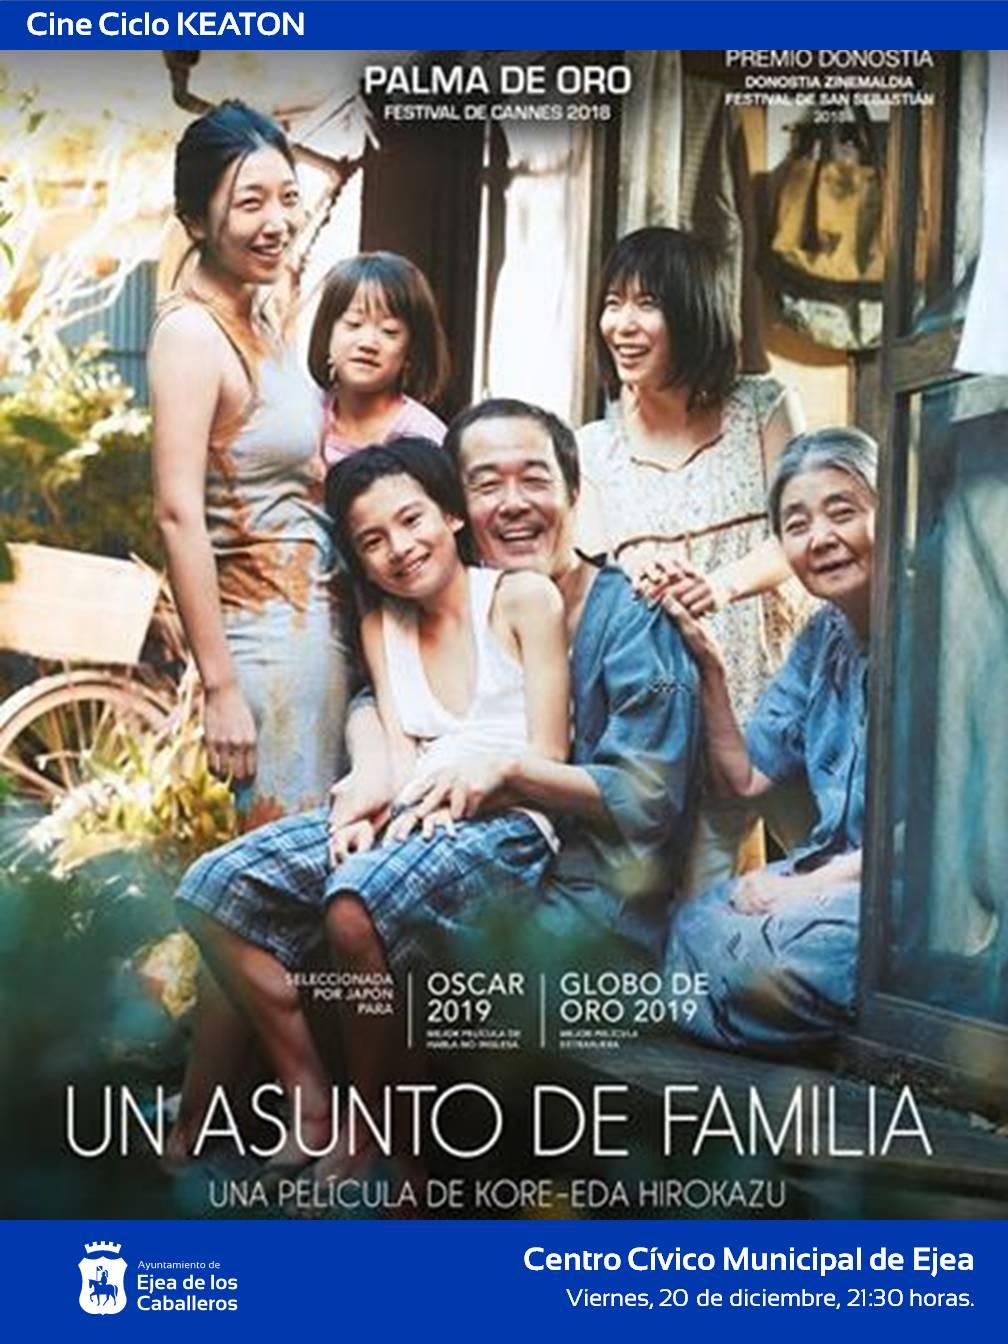 "CICLO DE CINE KEATON: ""Un asunto de familia"", una emotiva película del cineasta japonés Hirozaku Koreeda"